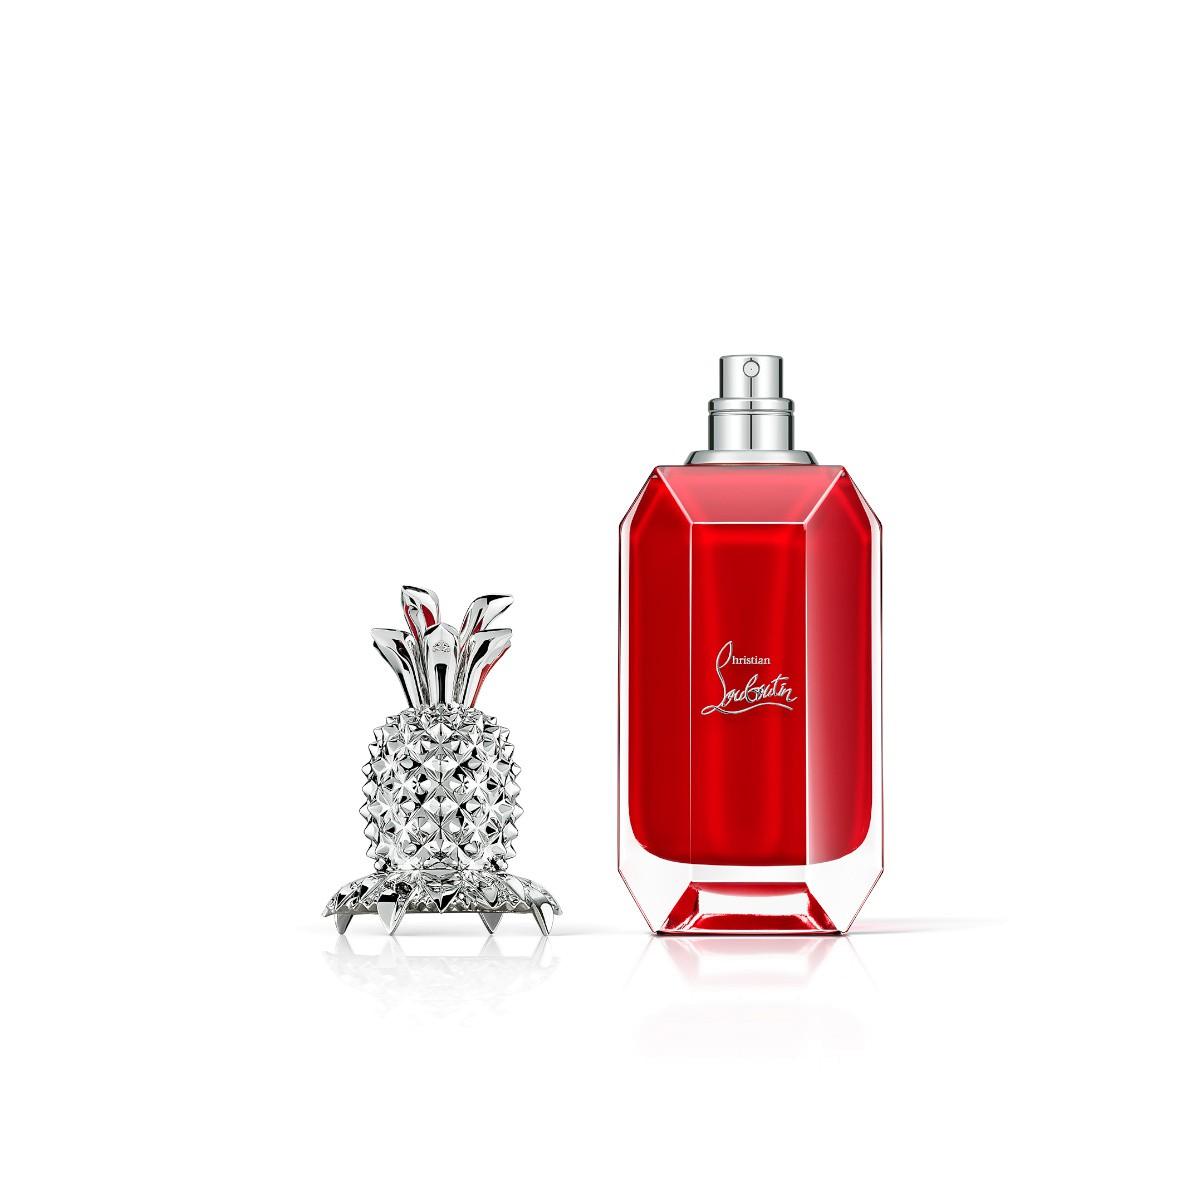 化妝品 - Loubifunk Eau De Parfum - Christian Louboutin